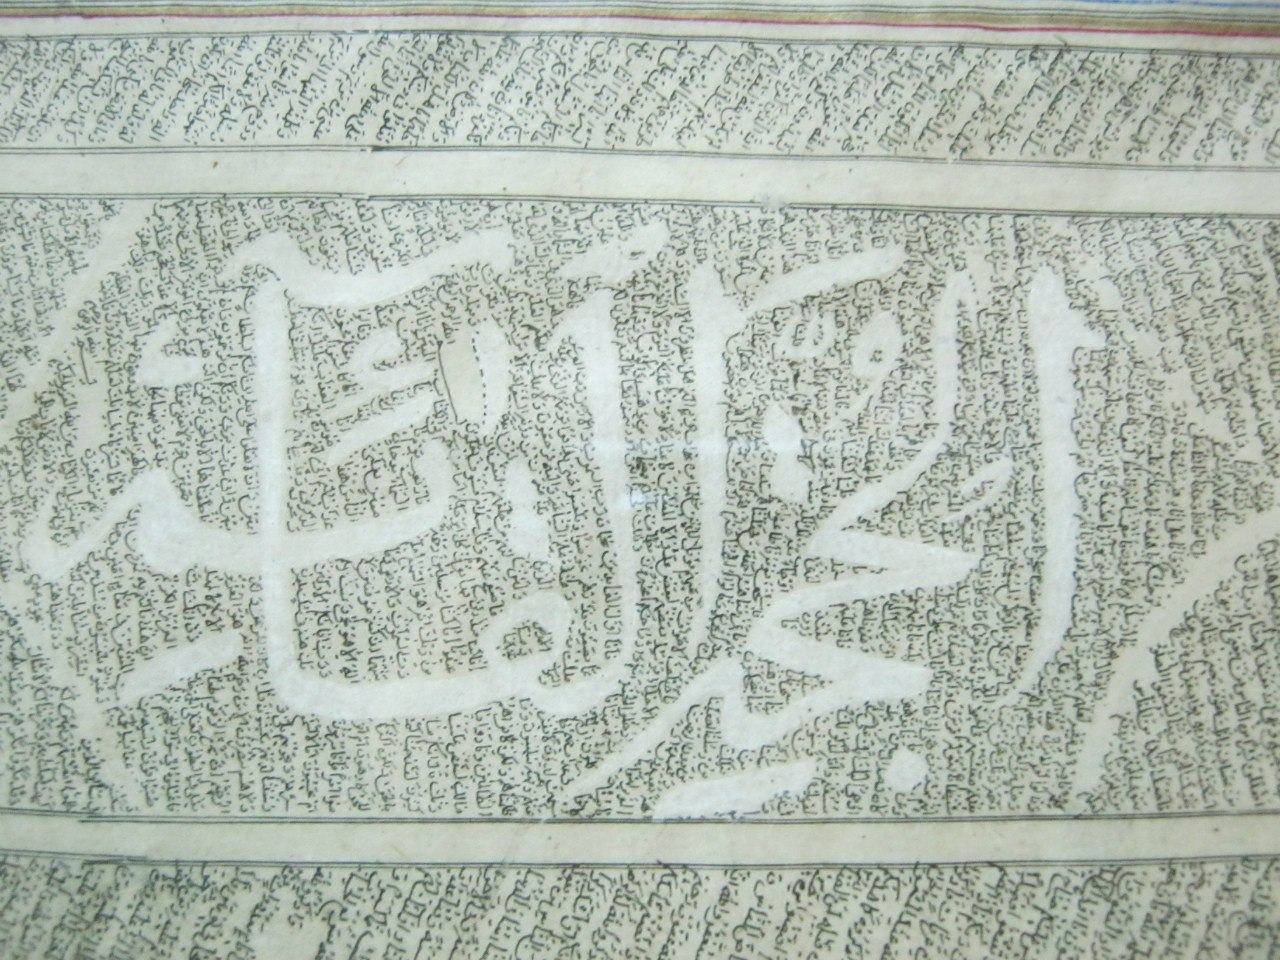 арабский язык на рукописном Коране